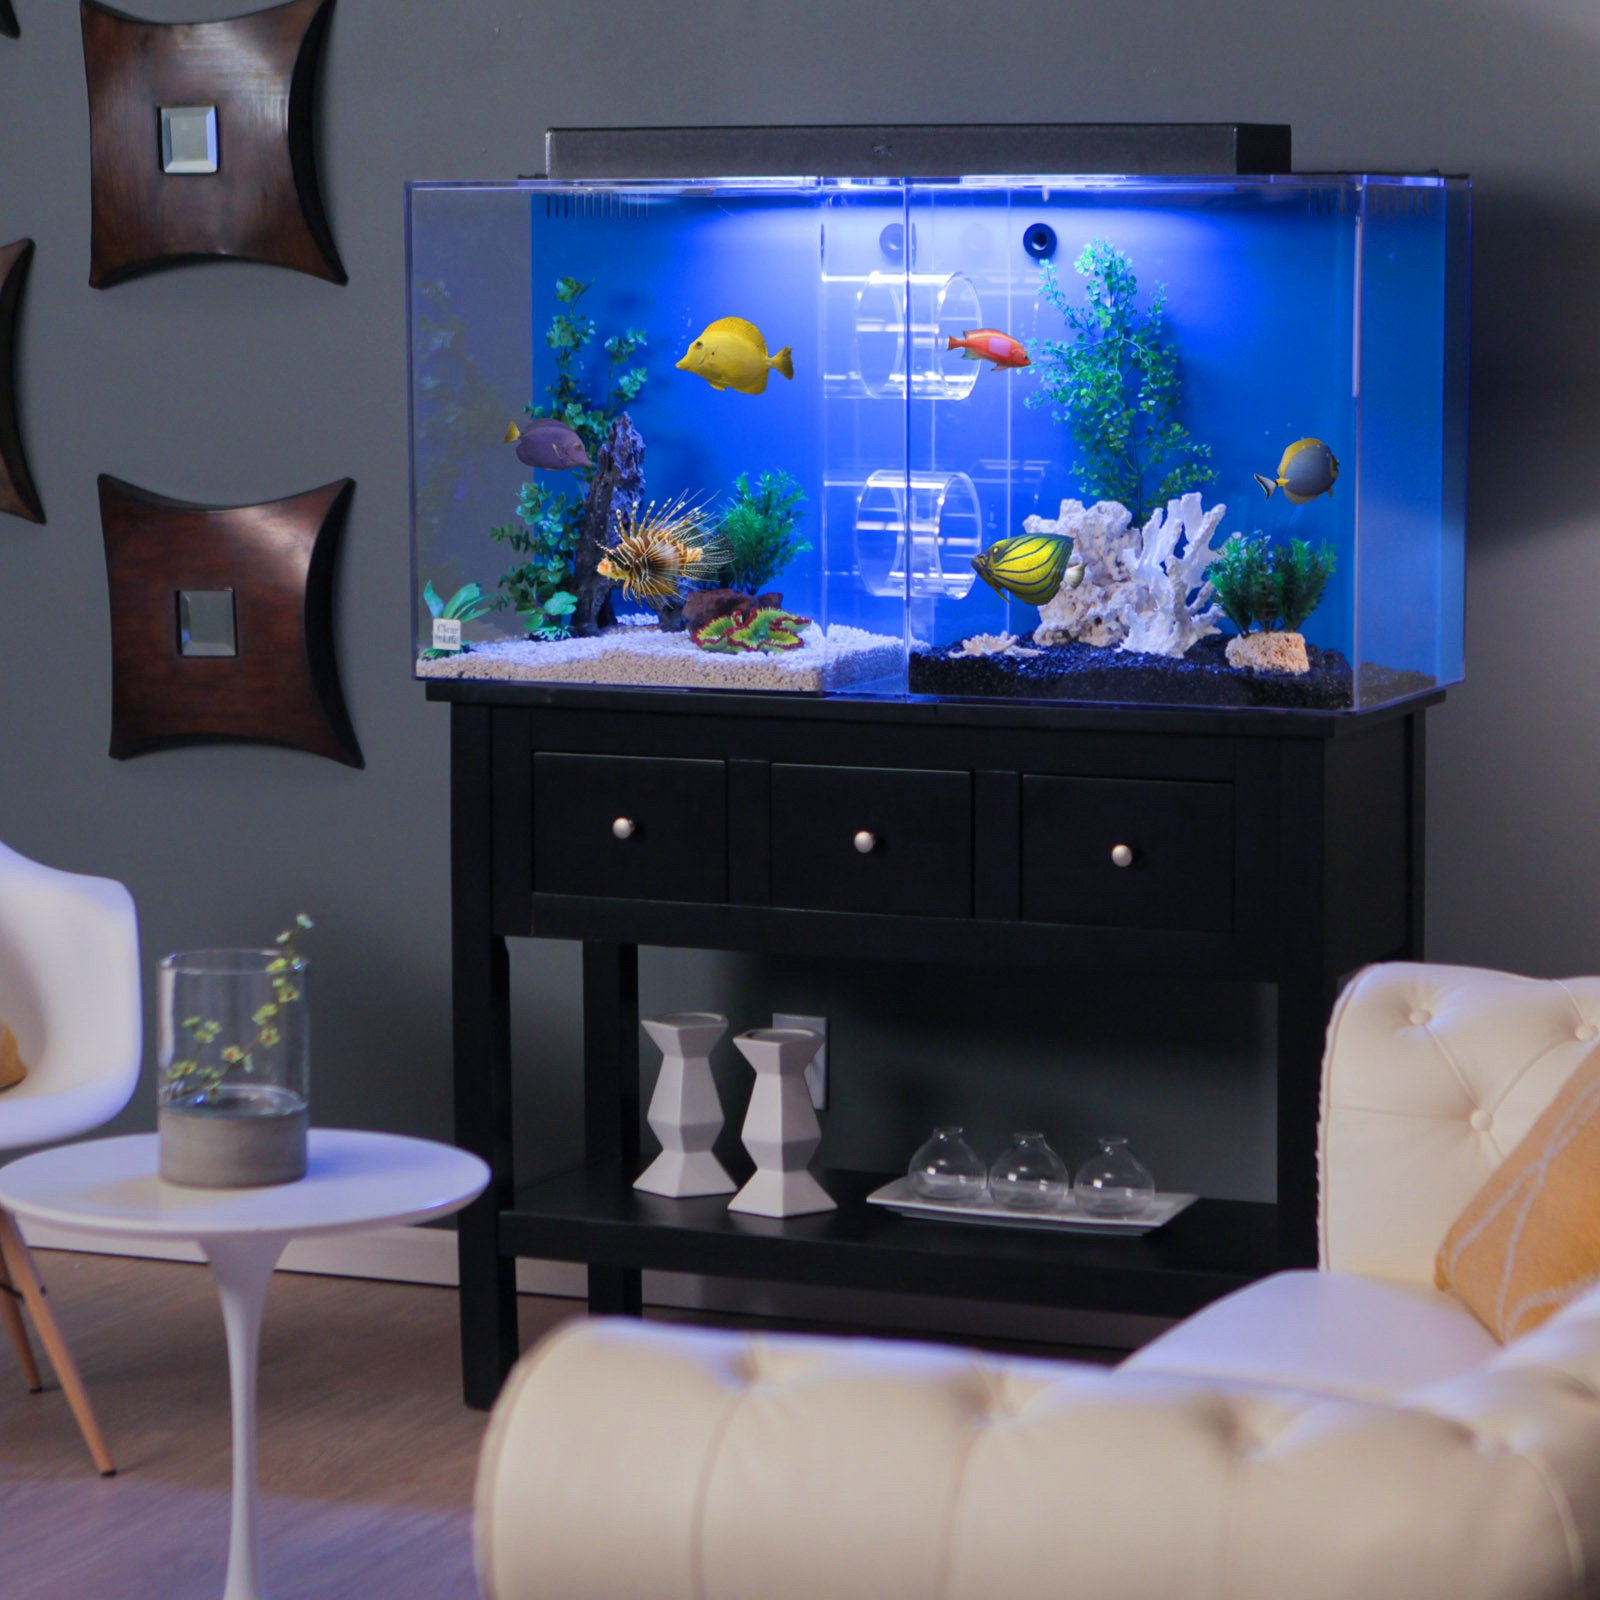 Fish for aquarium buy - Fish For Aquarium Buy